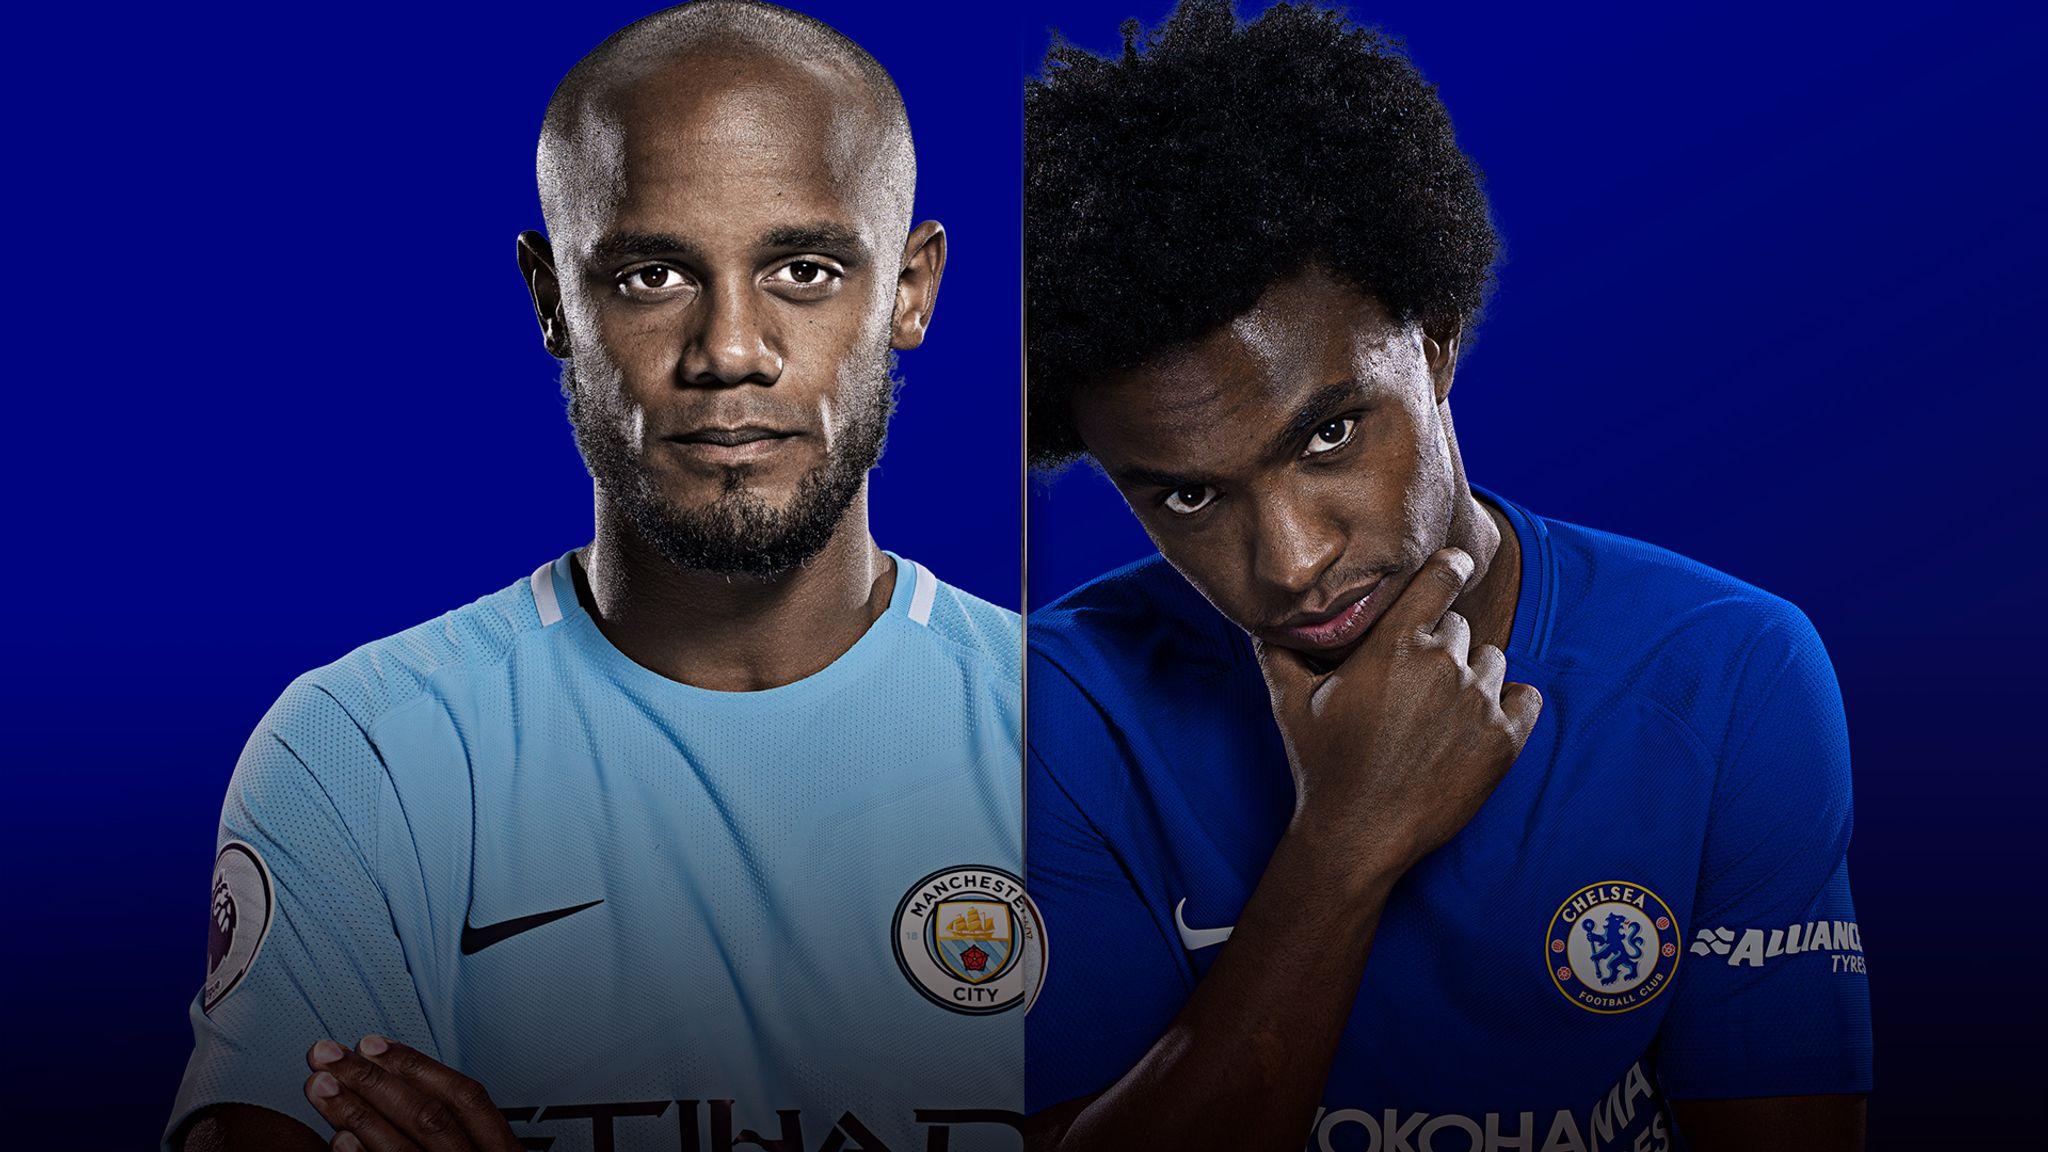 Live match preview - Man City vs Chelsea 04.03.2018